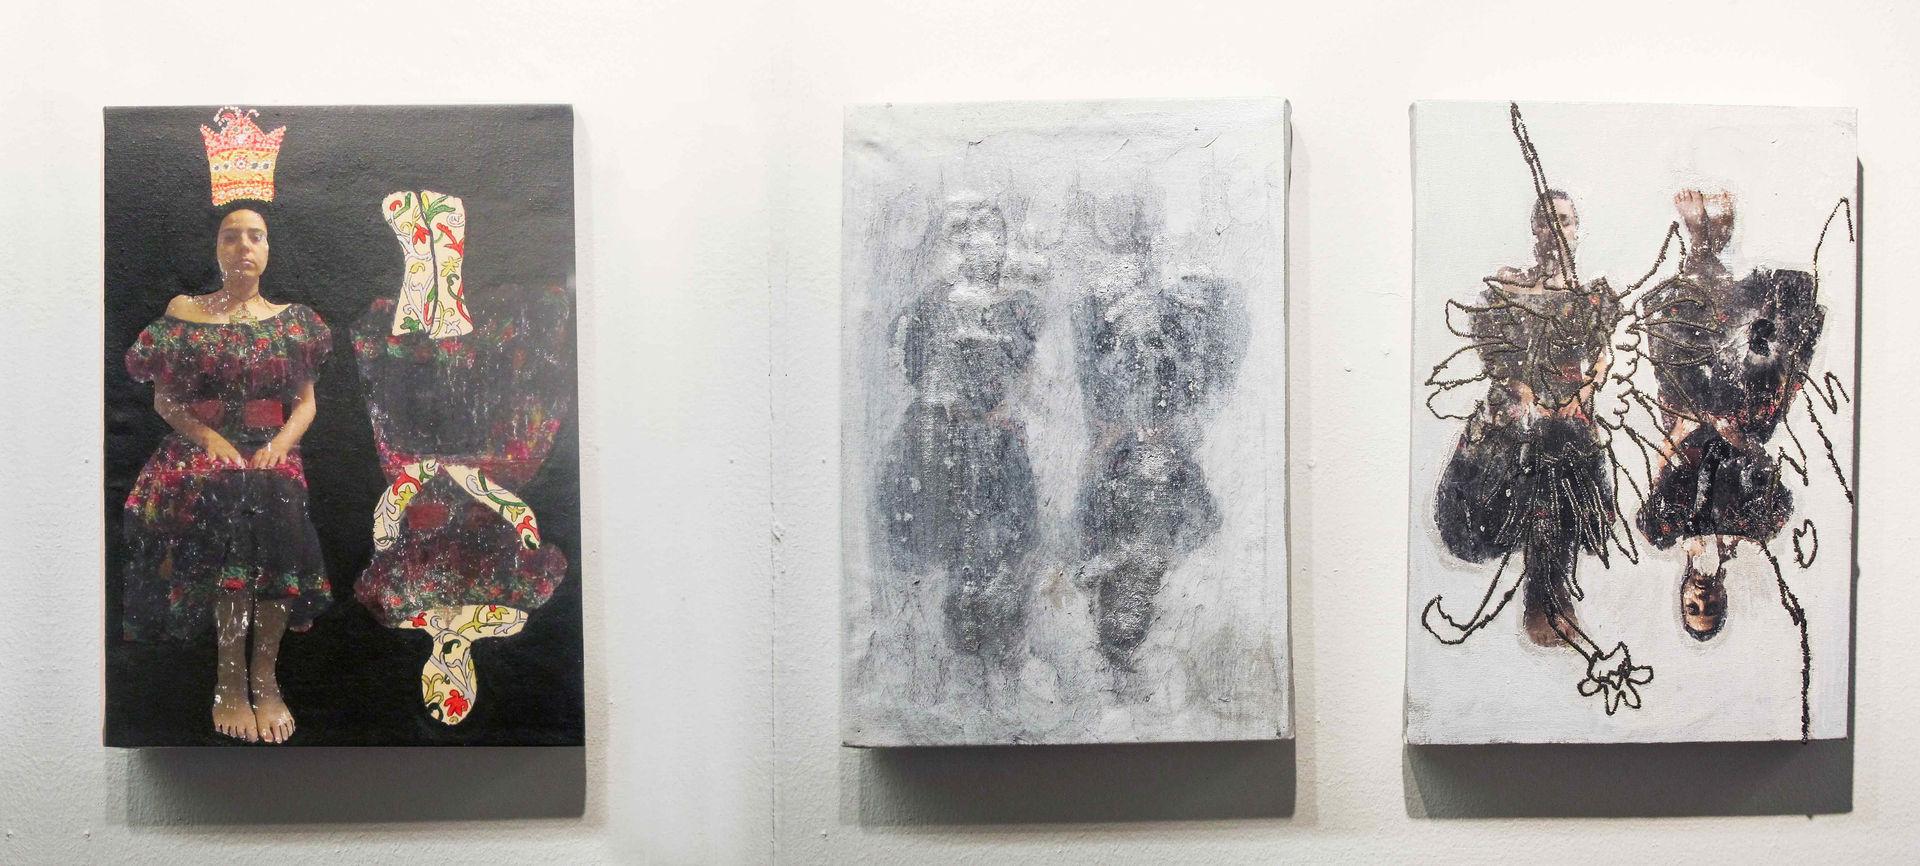 Fatemeh Takhtkeshian, Fragmented, 2016, Mixed media on canvas, 22x29 cm